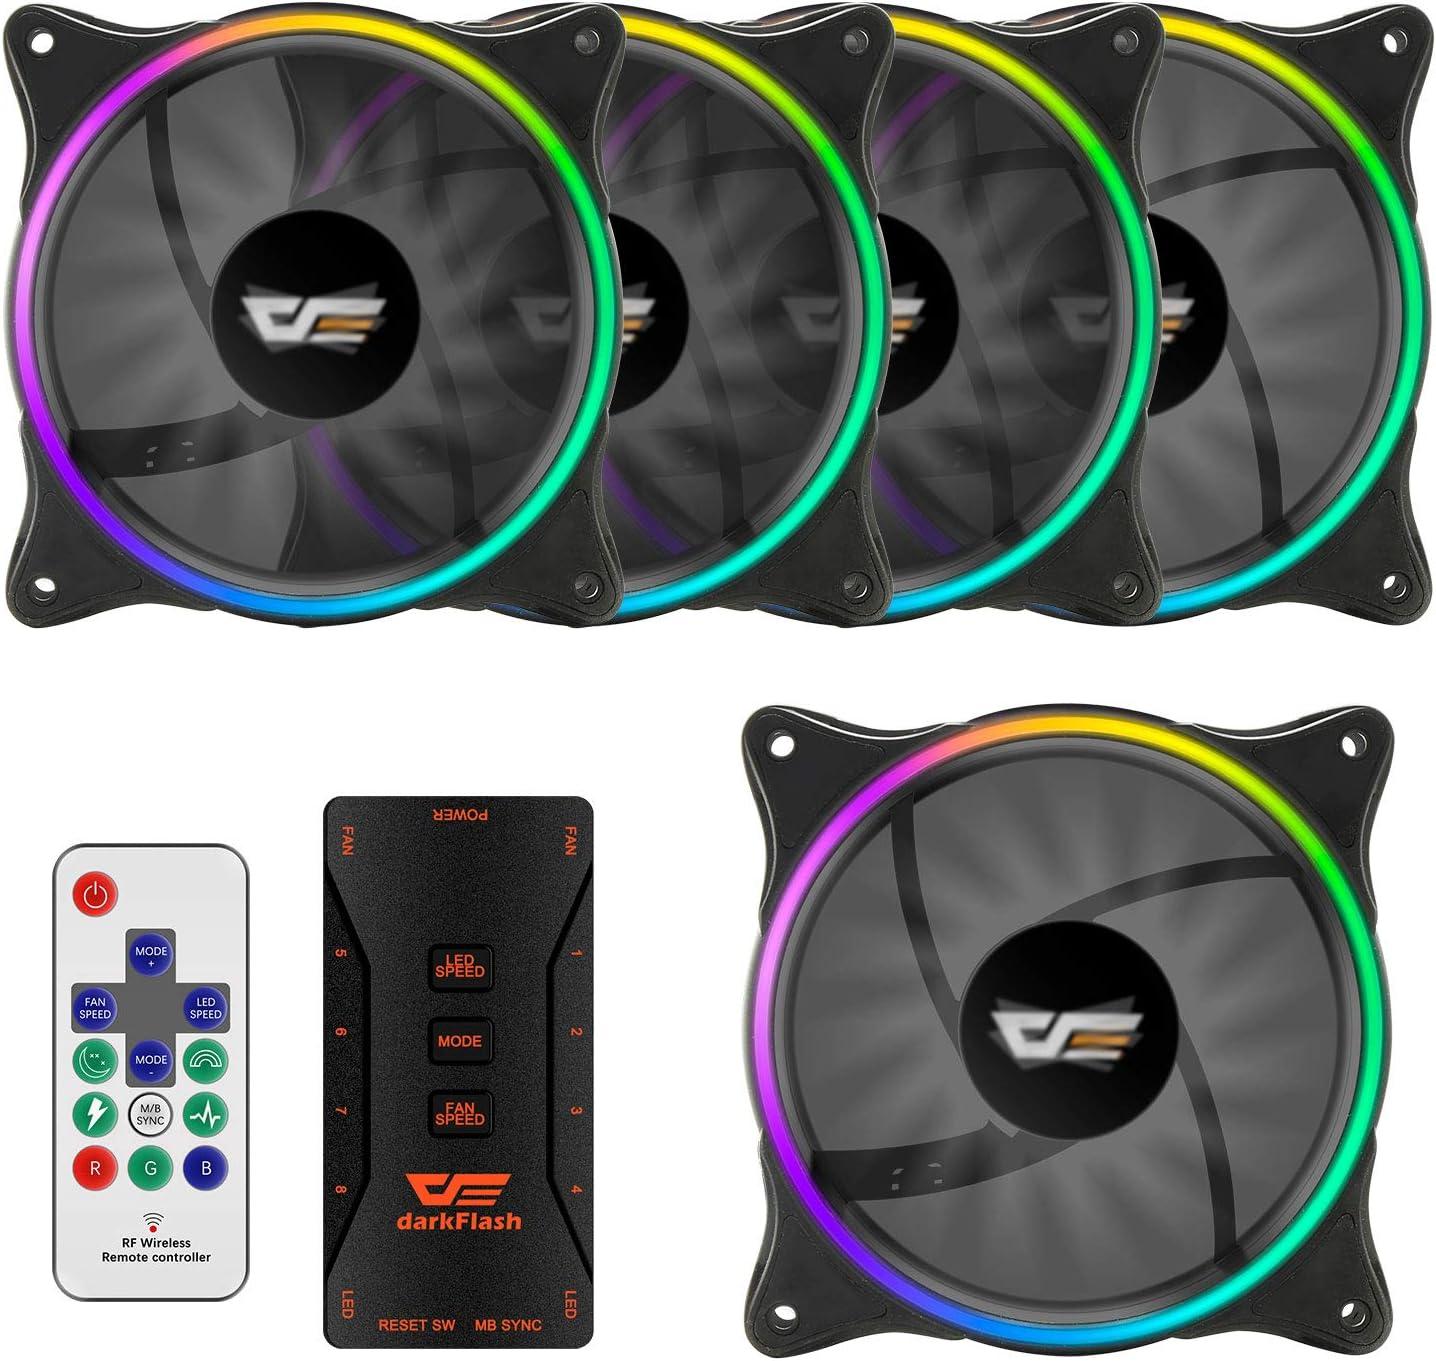 darkFlash 120mm RGB LED Case Fan for PC Cases CPU Cooling Fan Water Cooling Fan Addressable RGB Case Fan (MR12 5 Pack)